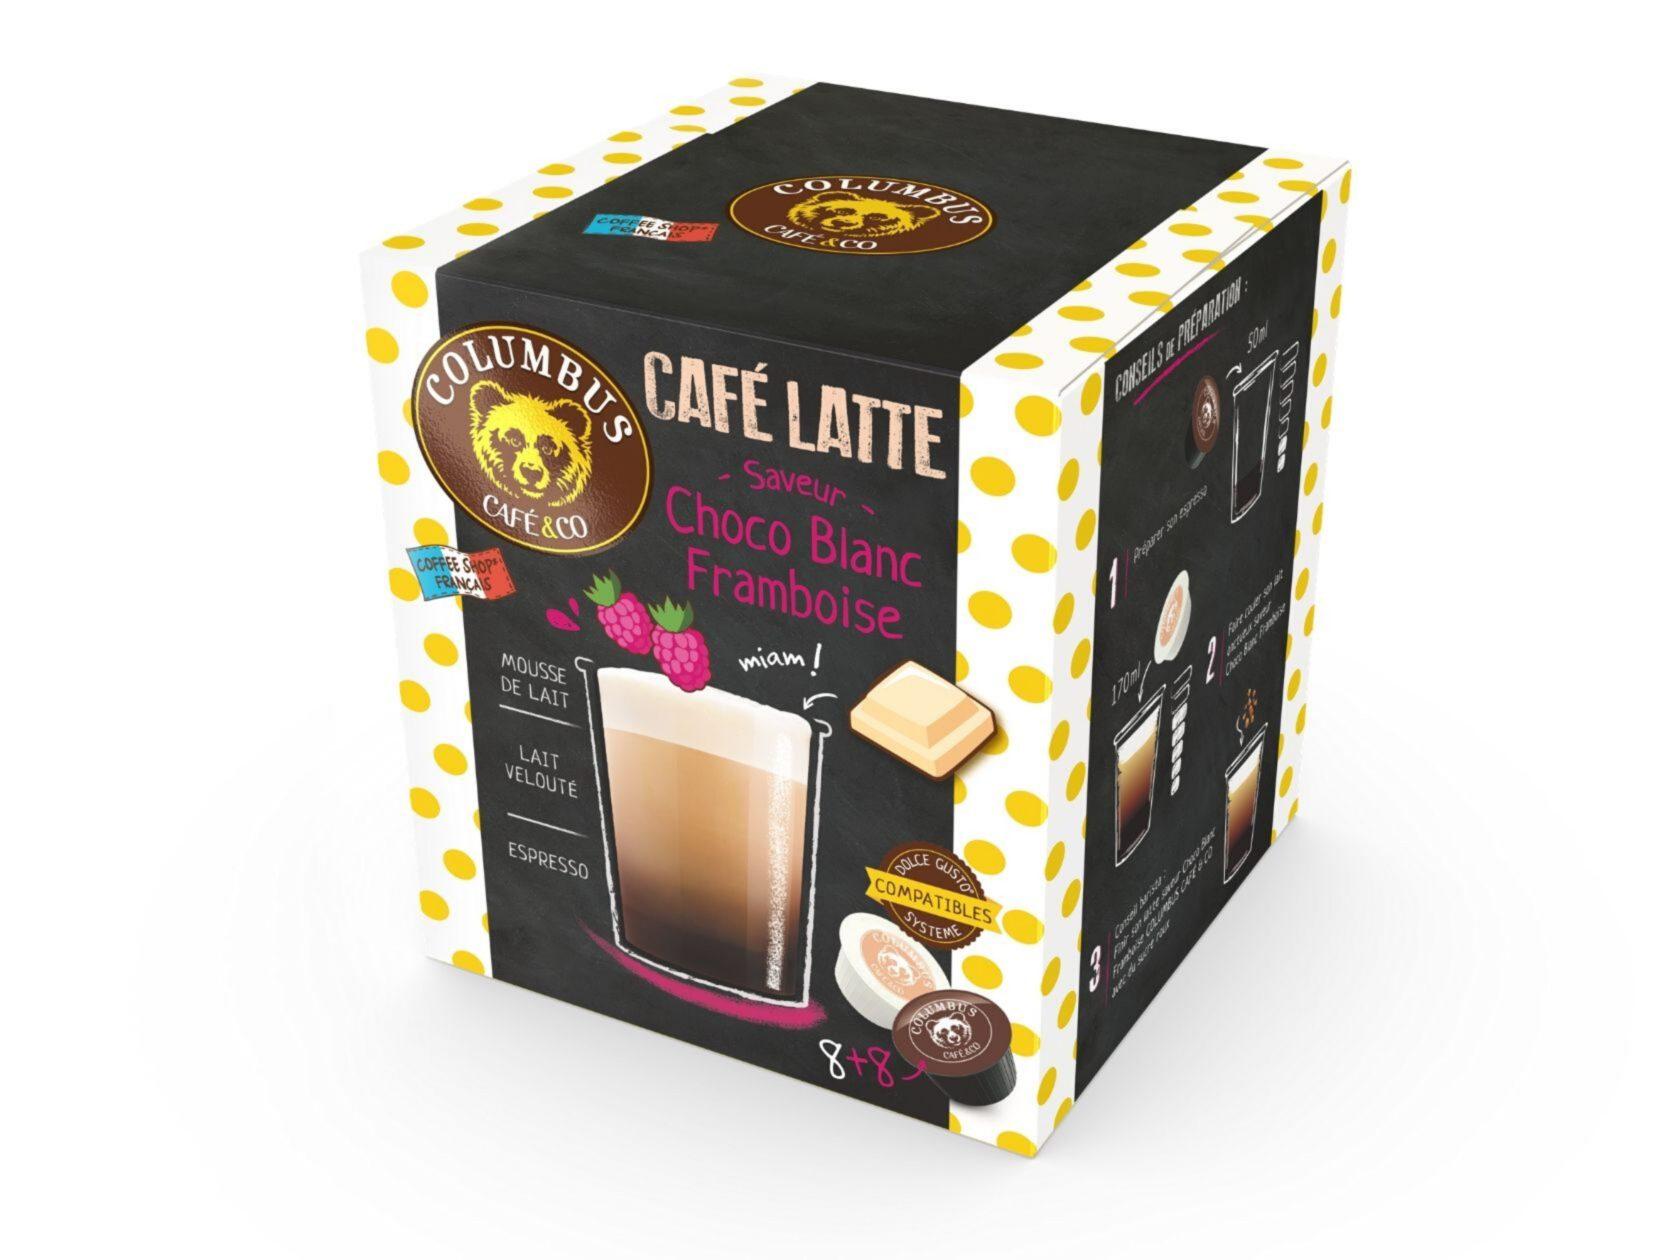 Le Café Latte saveur Framboise Choco blanc Dolce Gusto® x 16